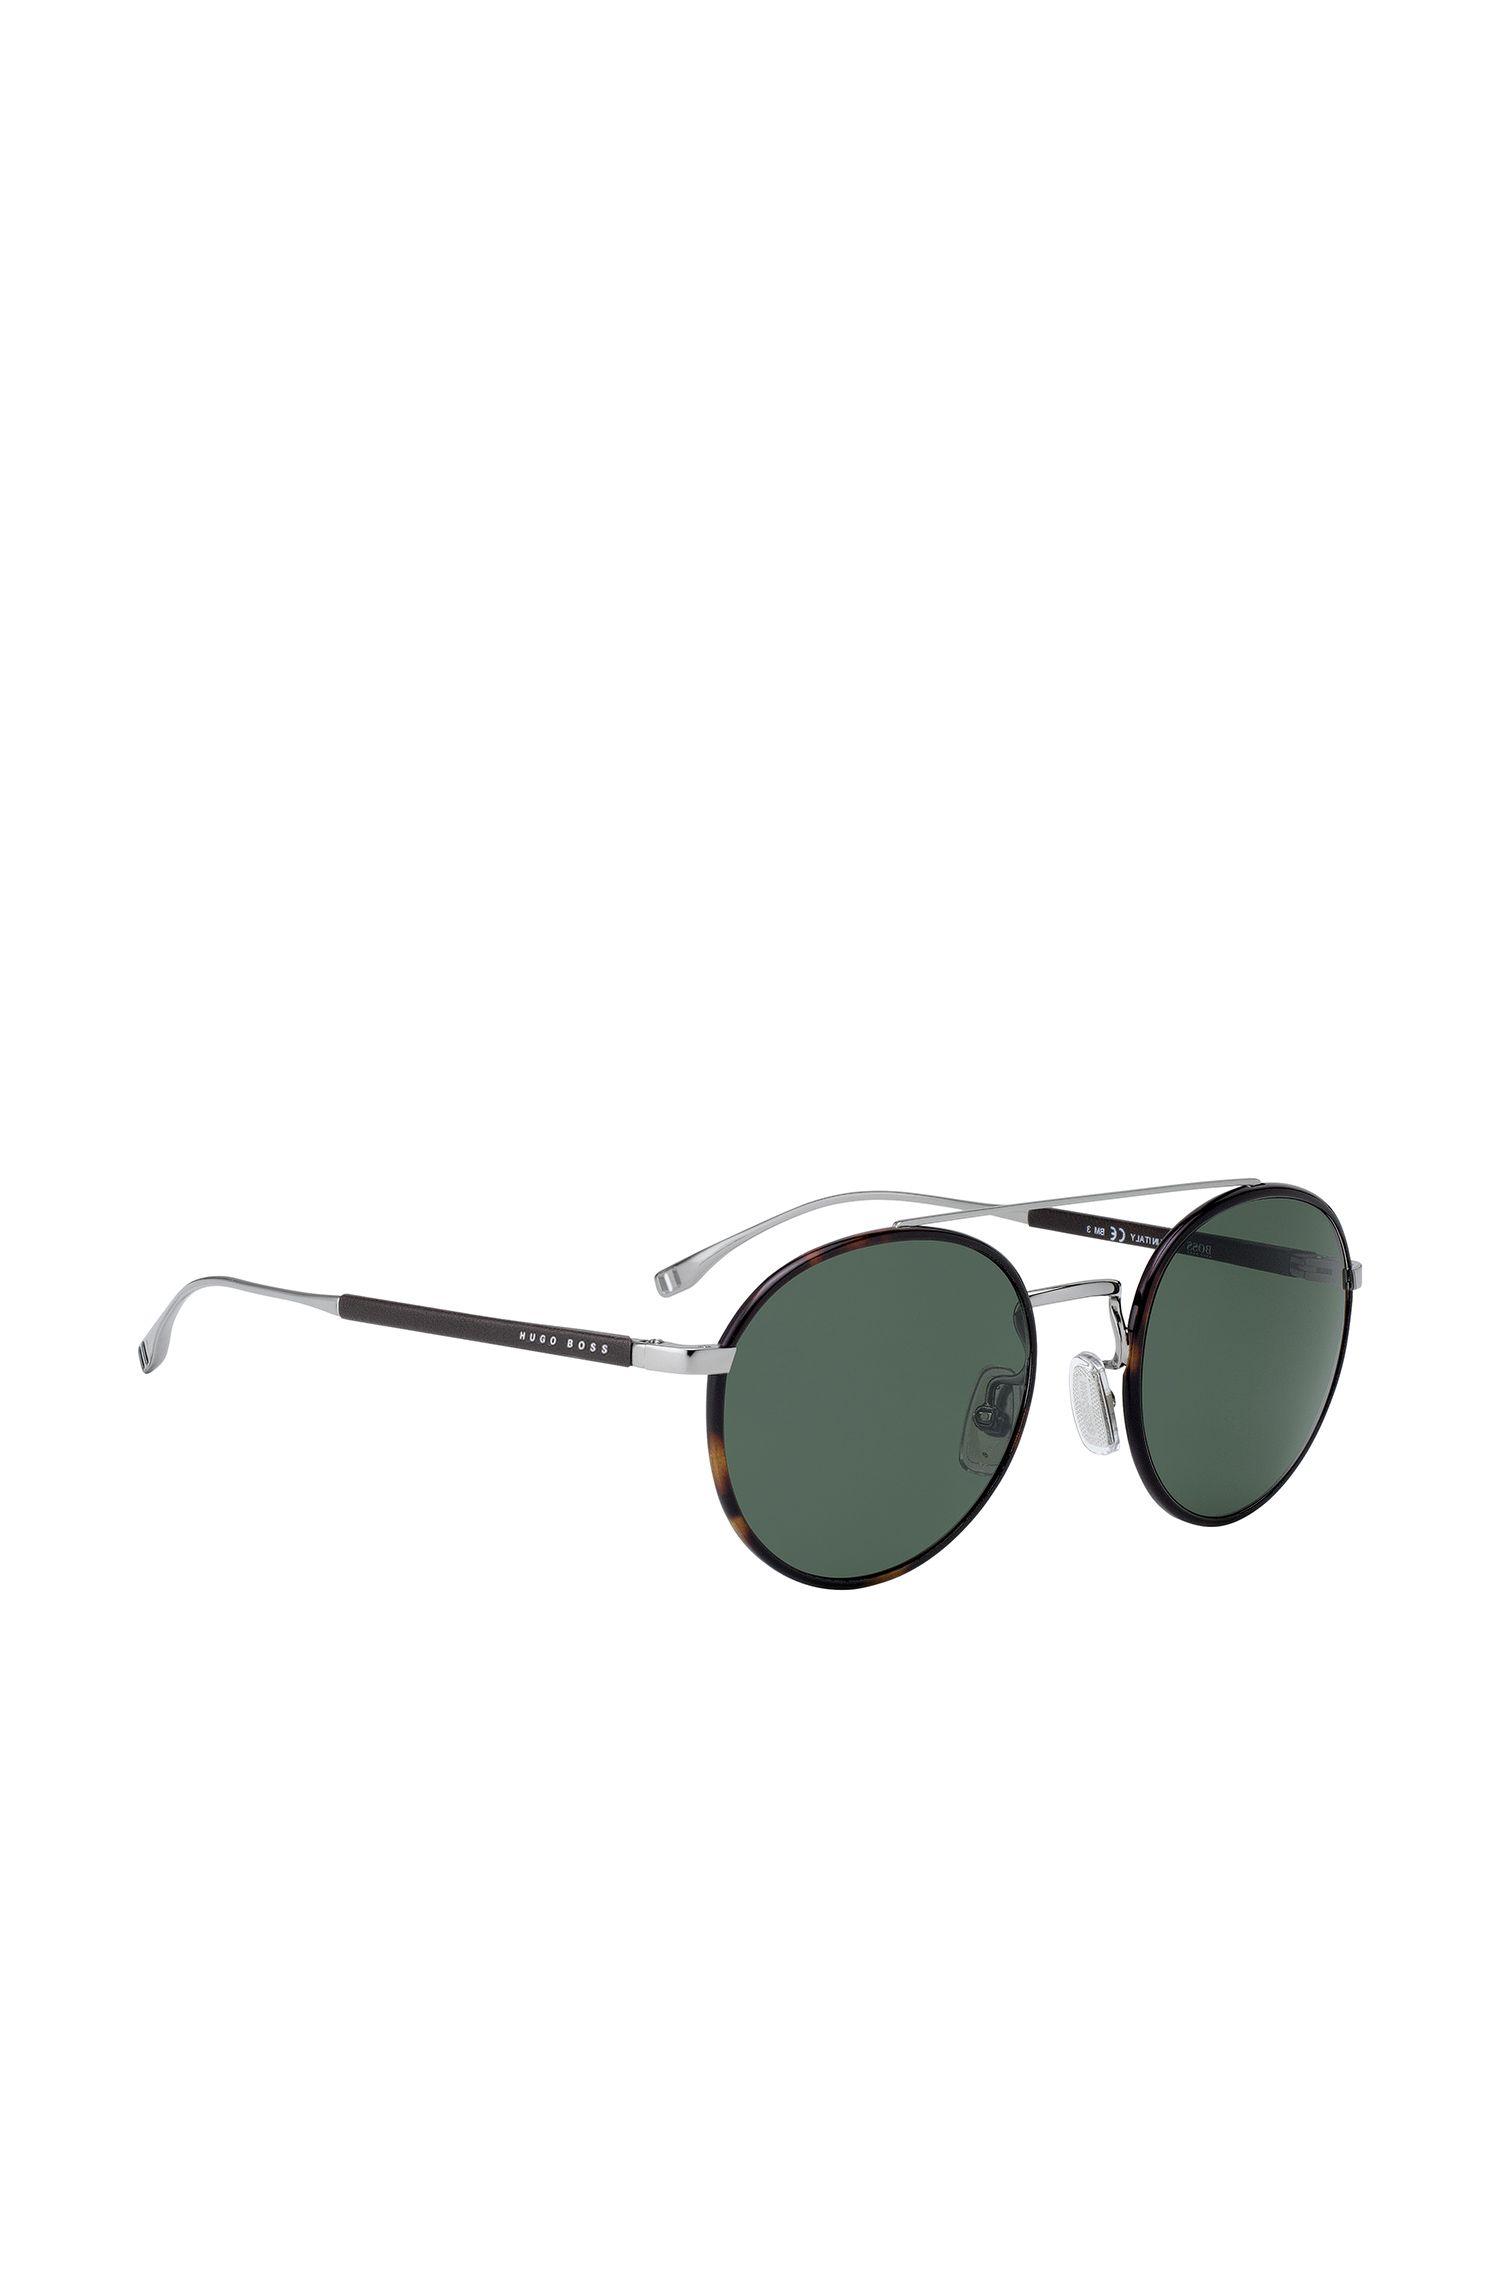 Panto-Sonnenbrille aus Acetat mit Doppelsteg und Lederbesatz